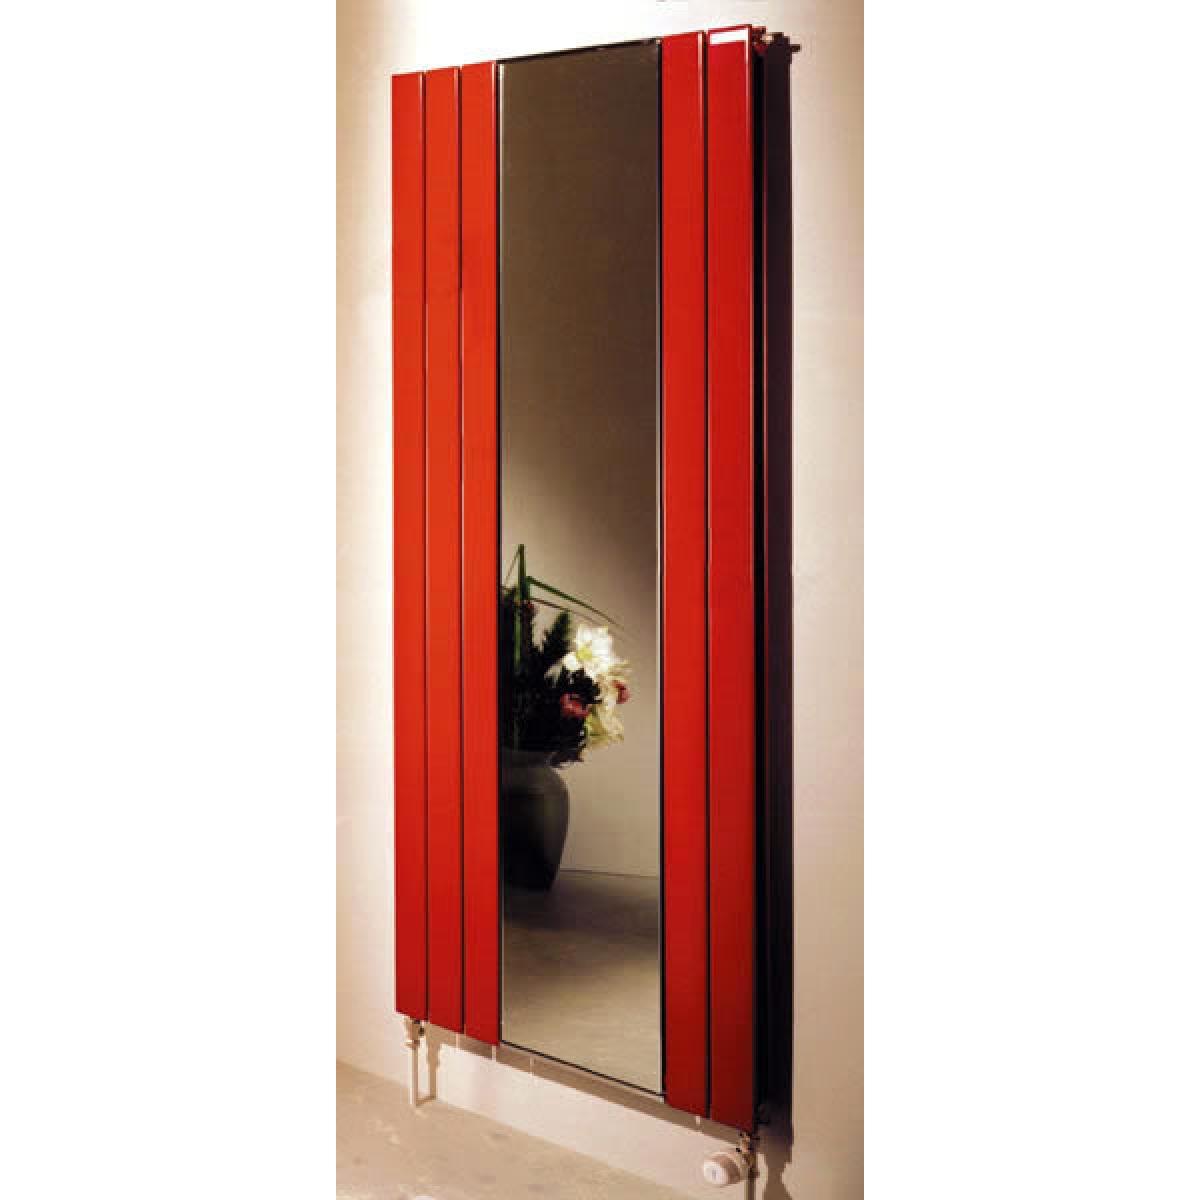 Zehnder roda radiator with mirror uk bathrooms for Mirror radiator